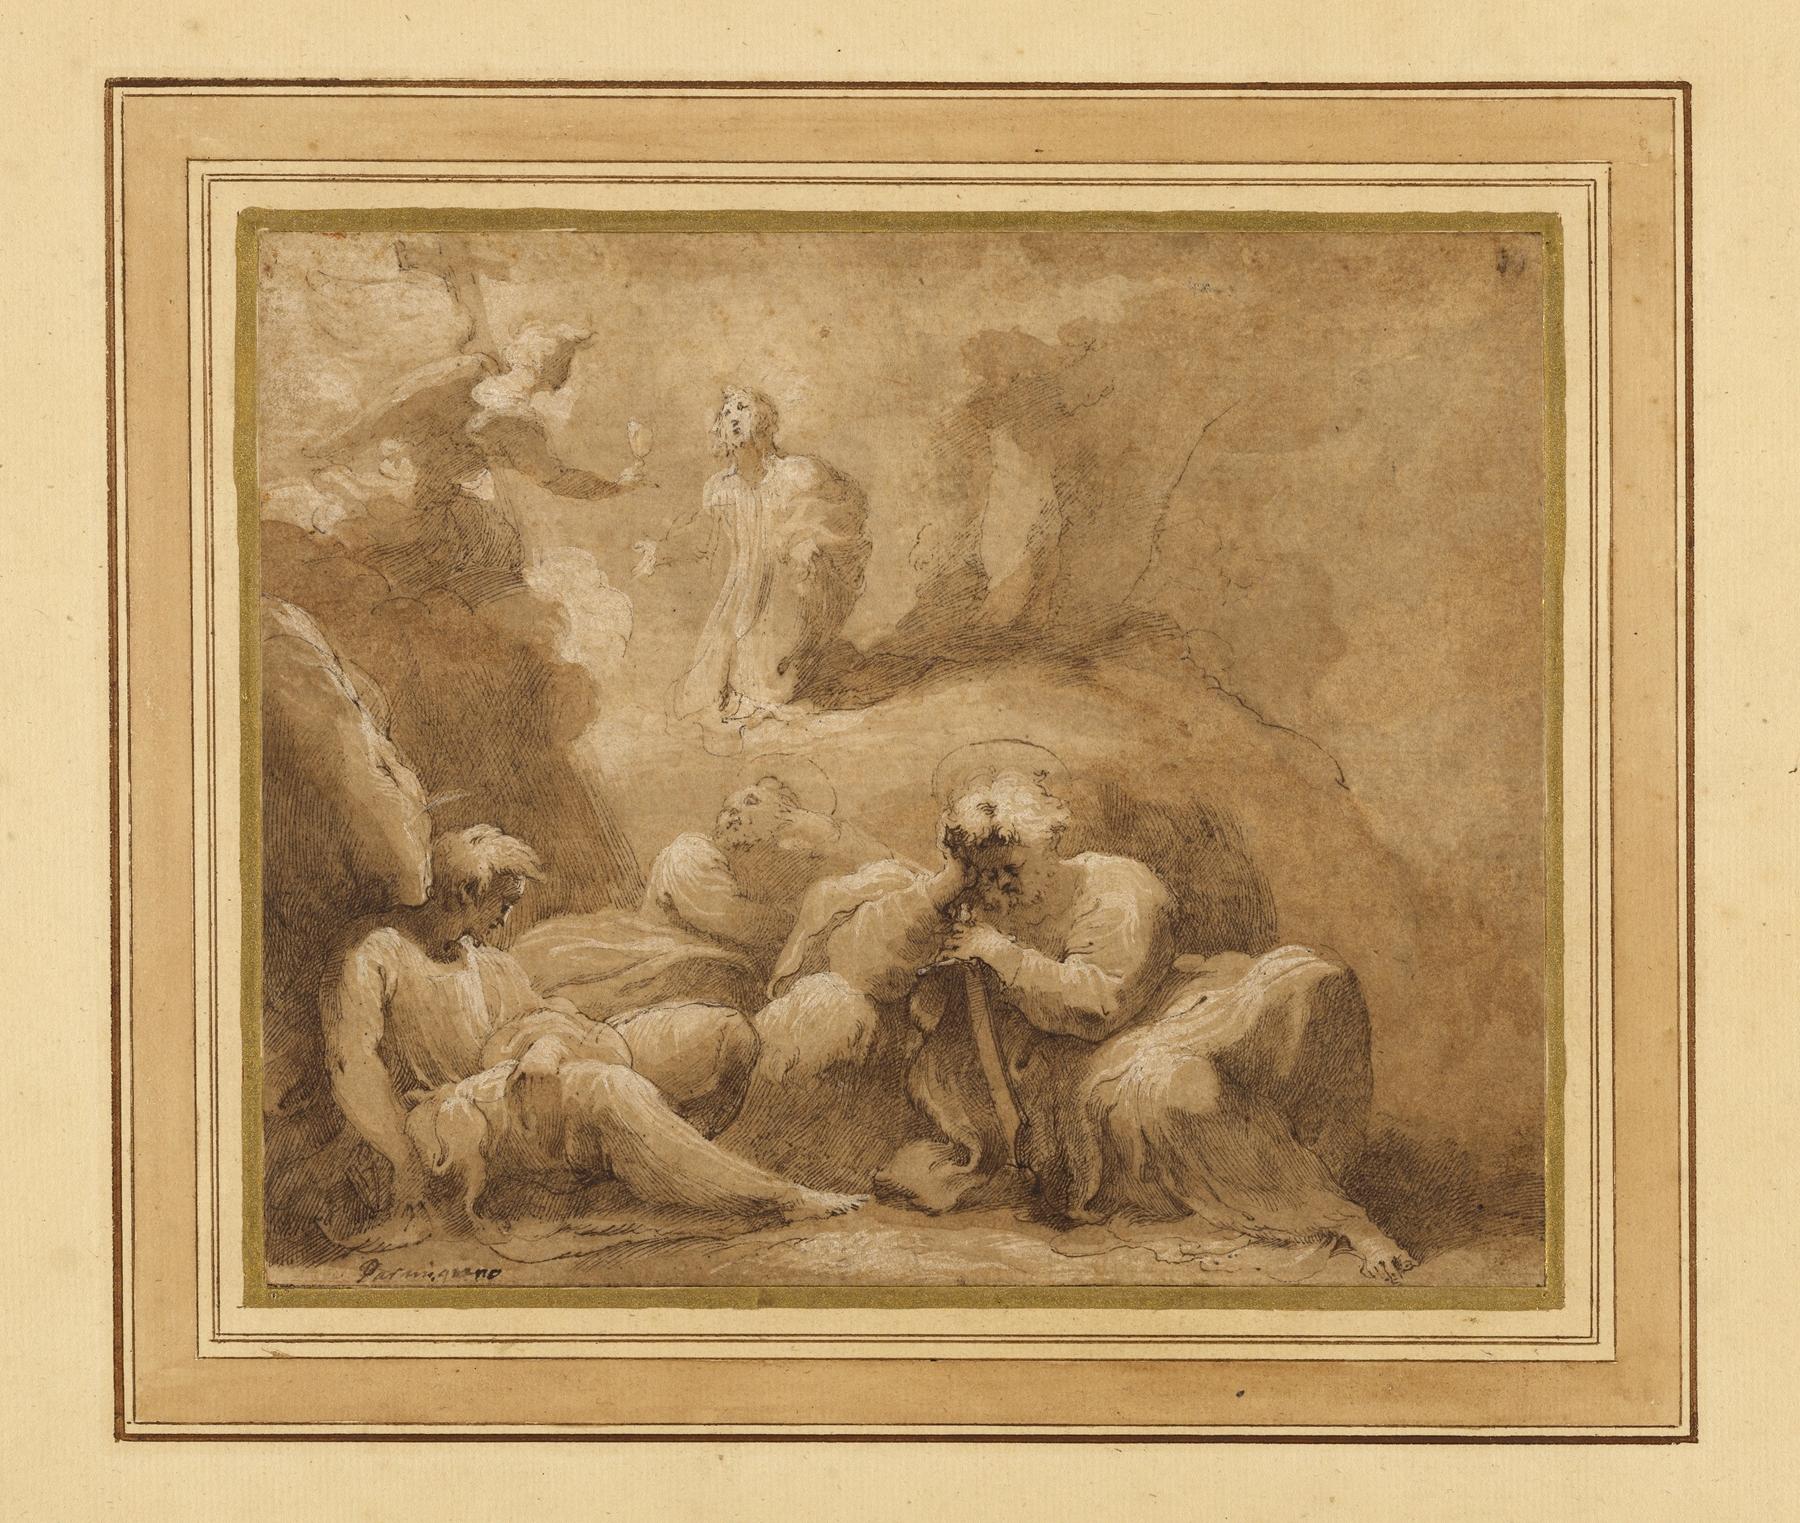 Valerio Castello - The Agony in the Garden